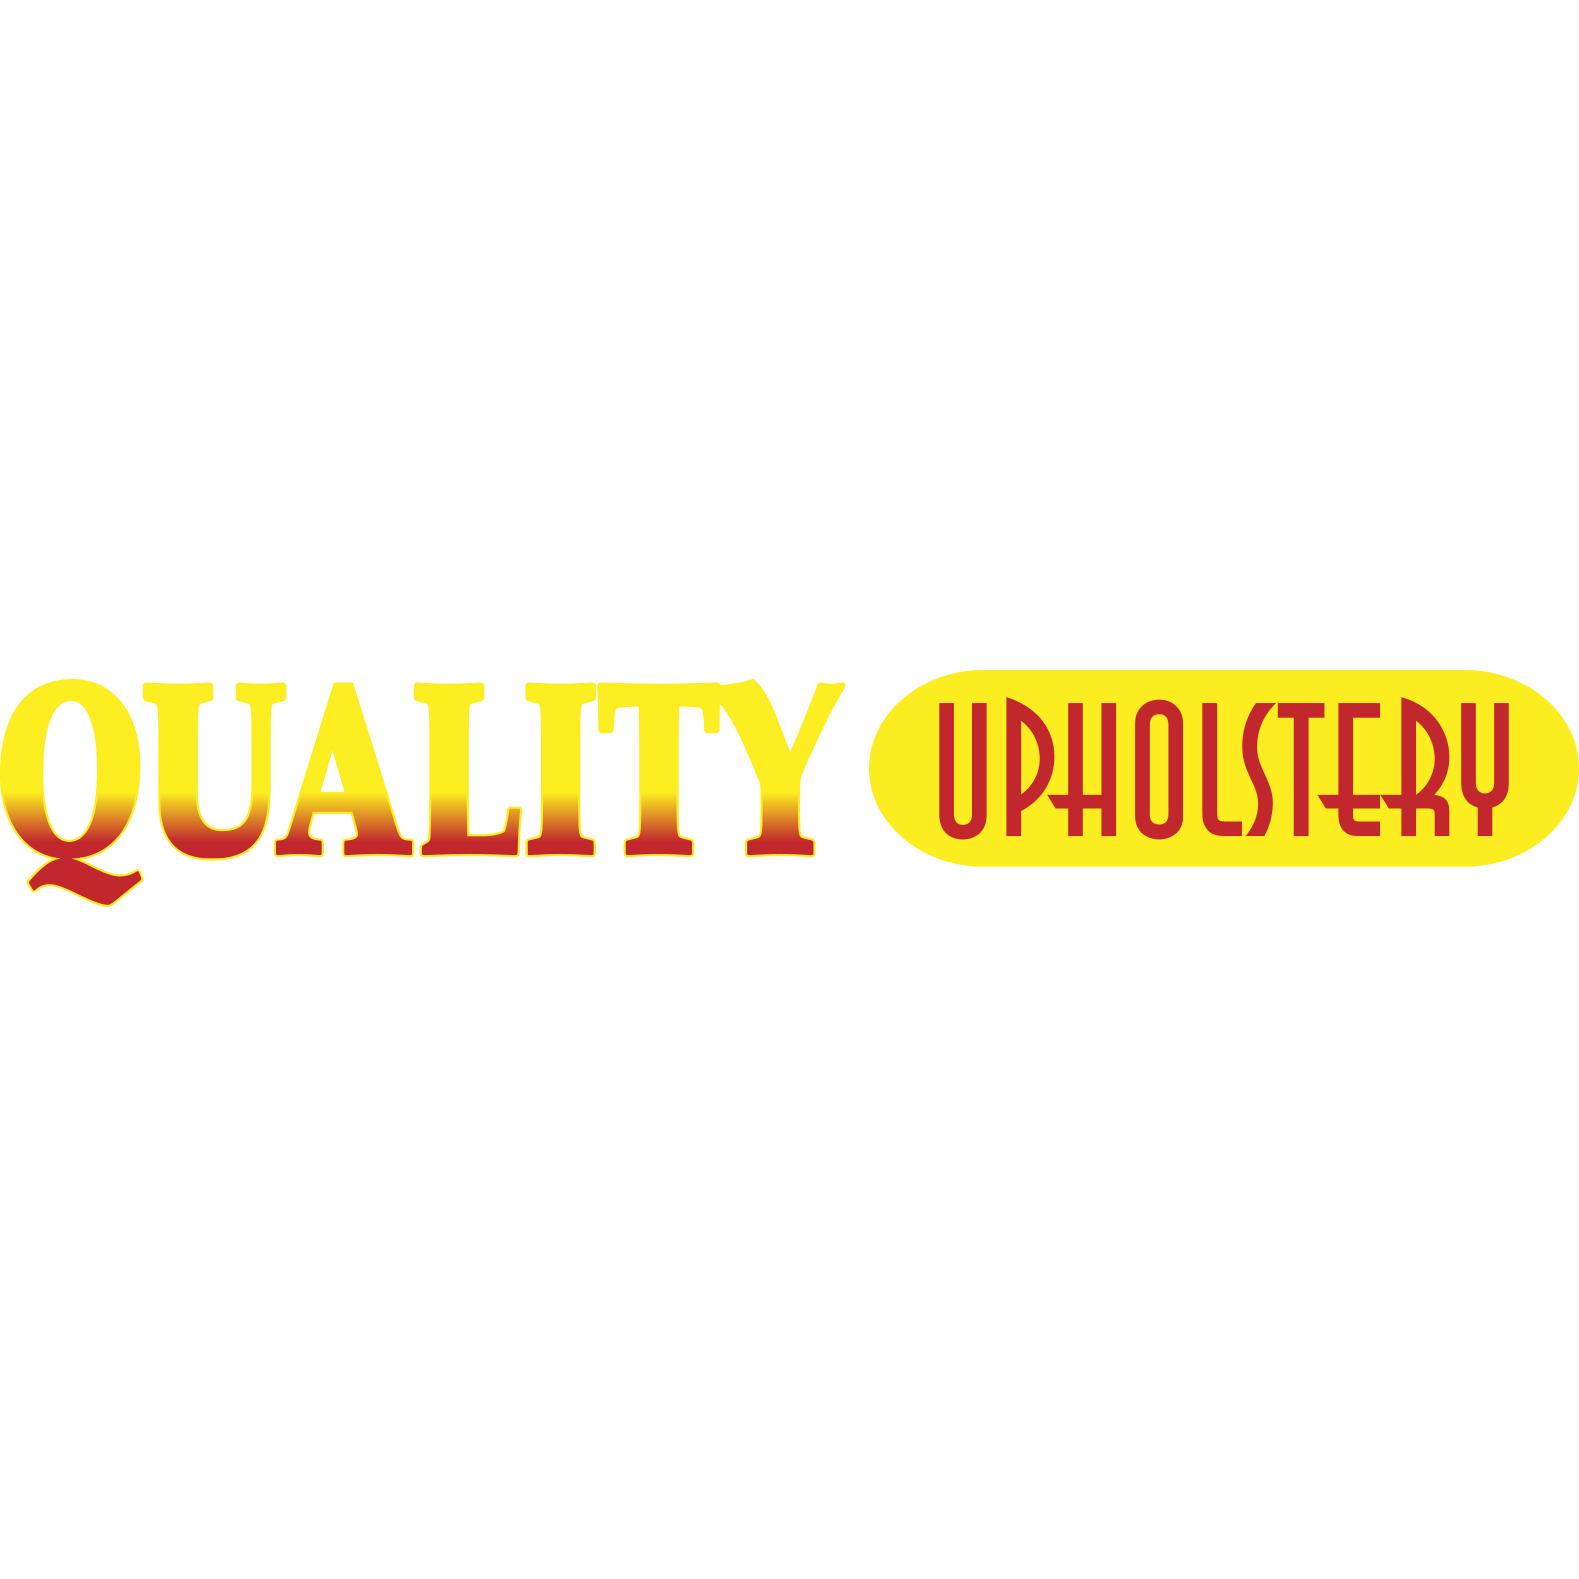 Quality Upholstery - Yuma, AZ - Drapery & Upholstery Stores